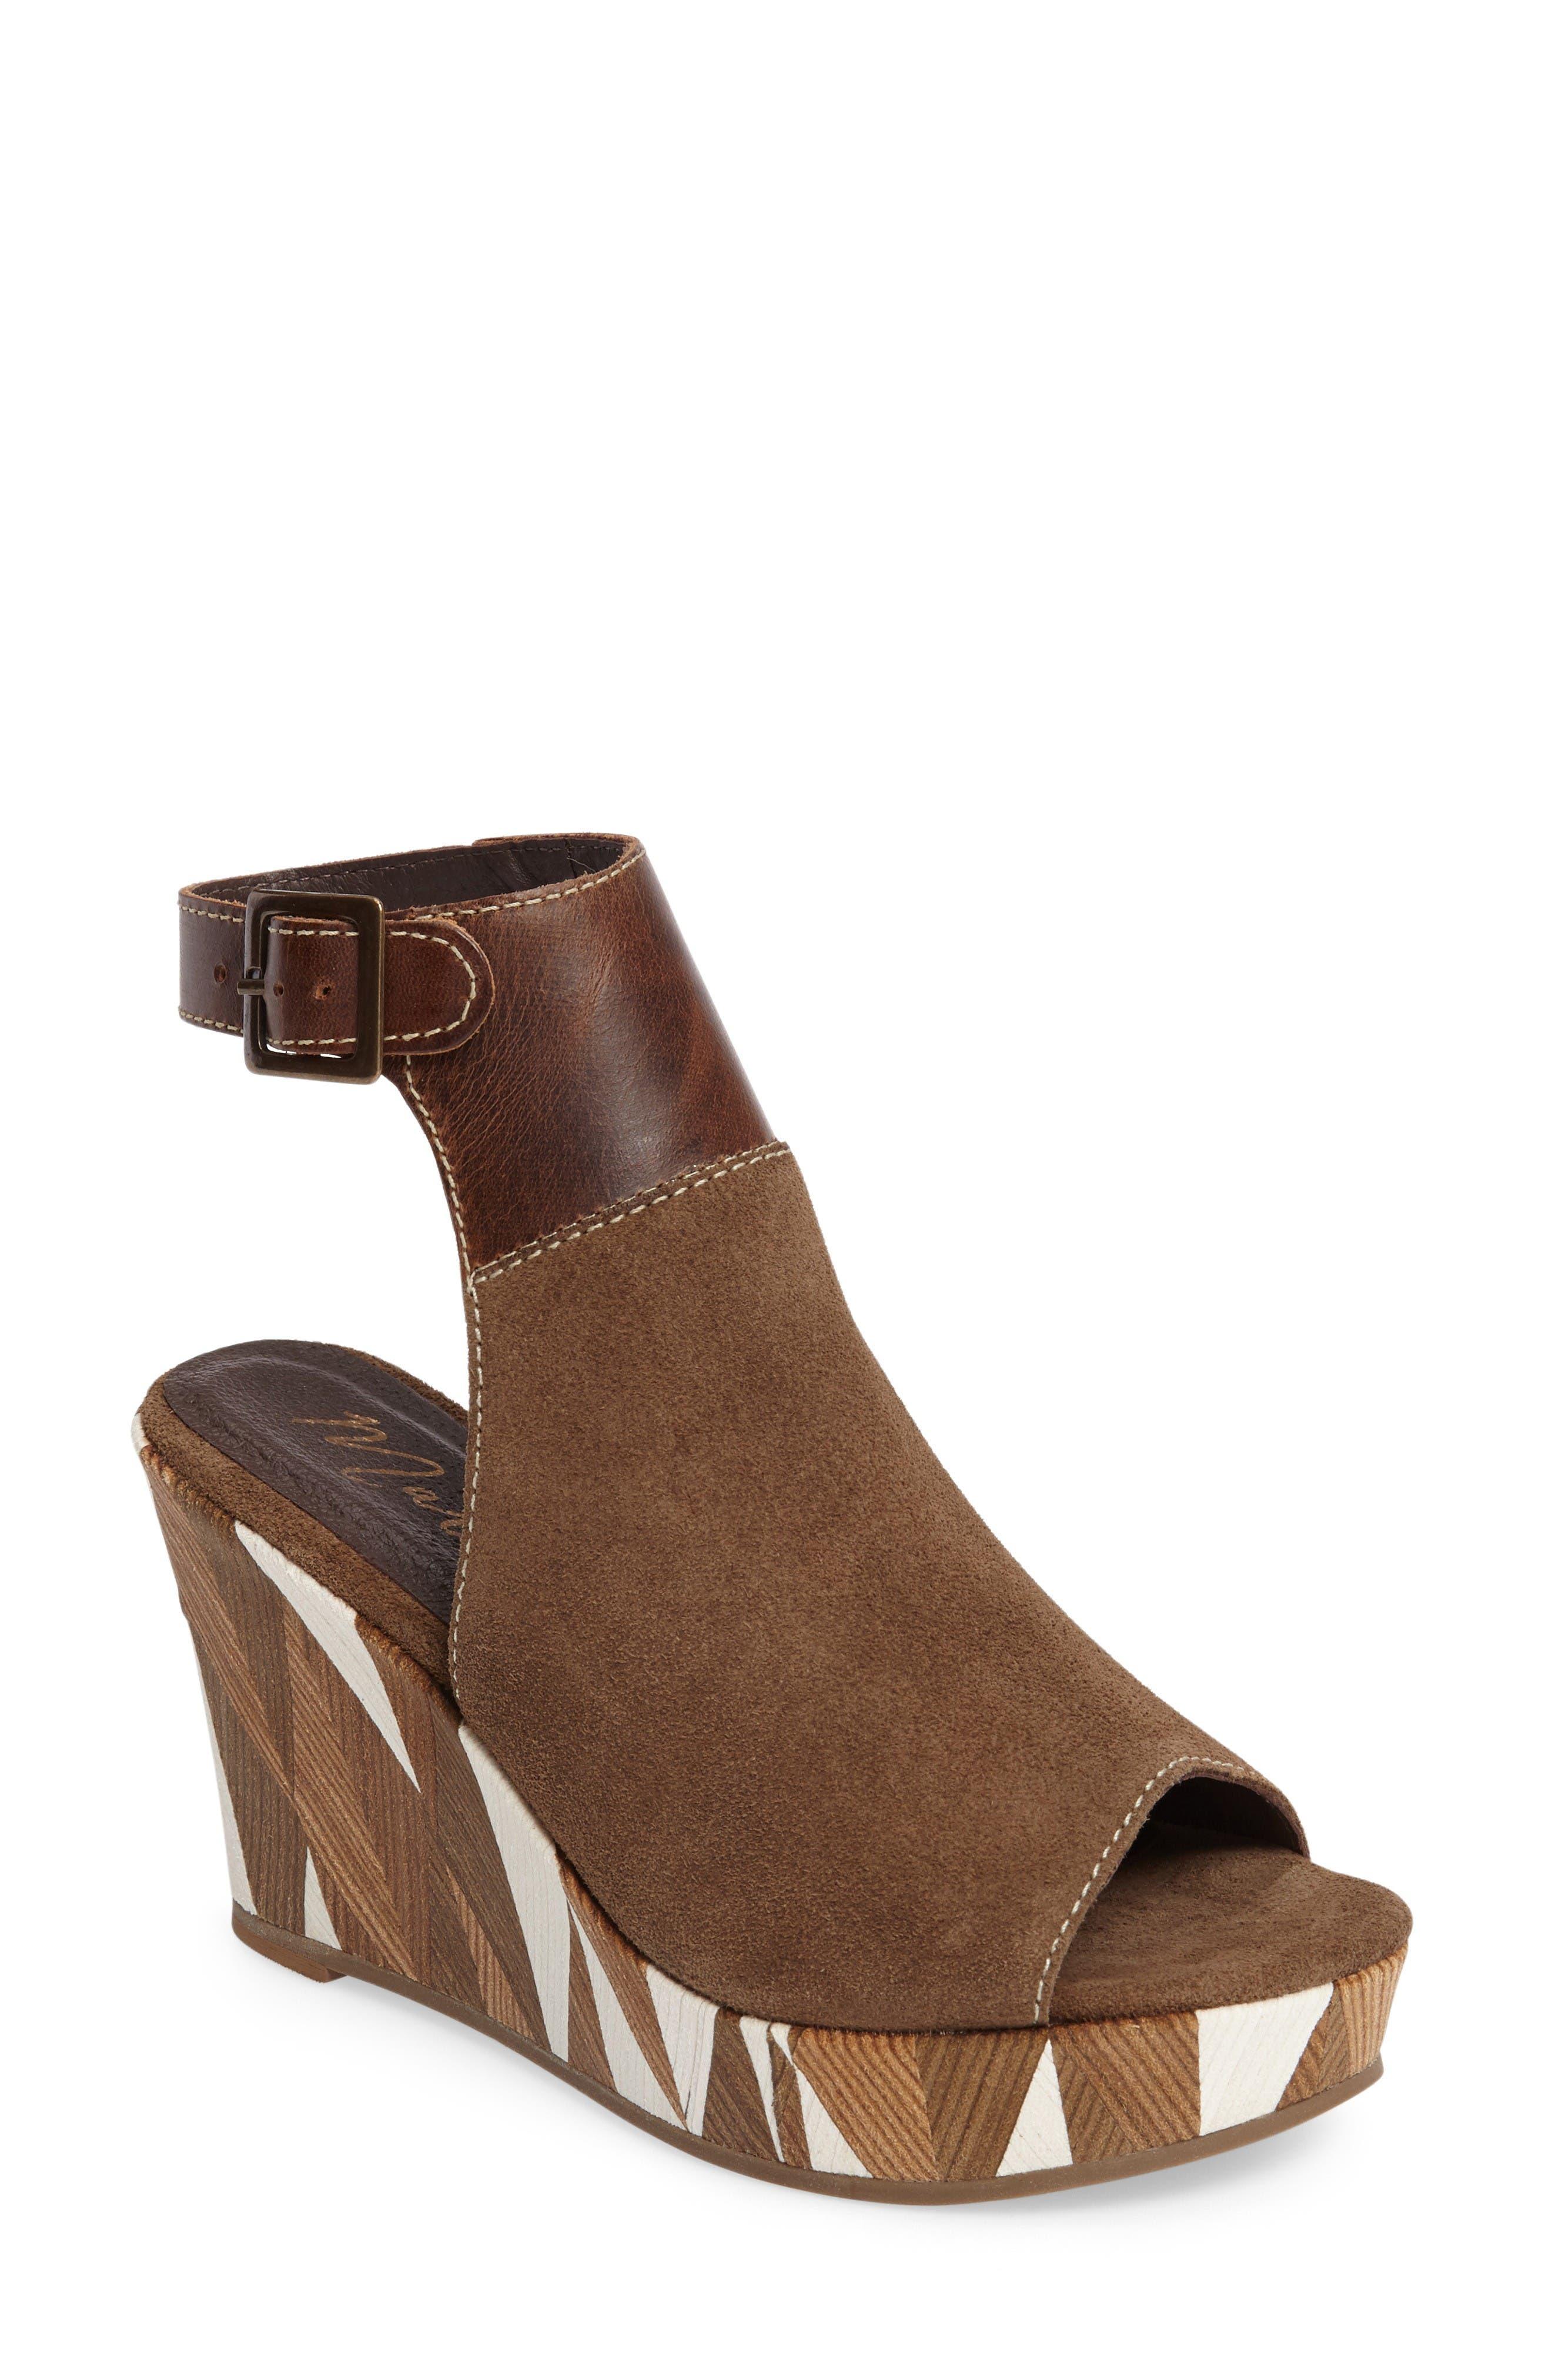 Main Image - Matisse Harlequin Wedge Sandal (Women)